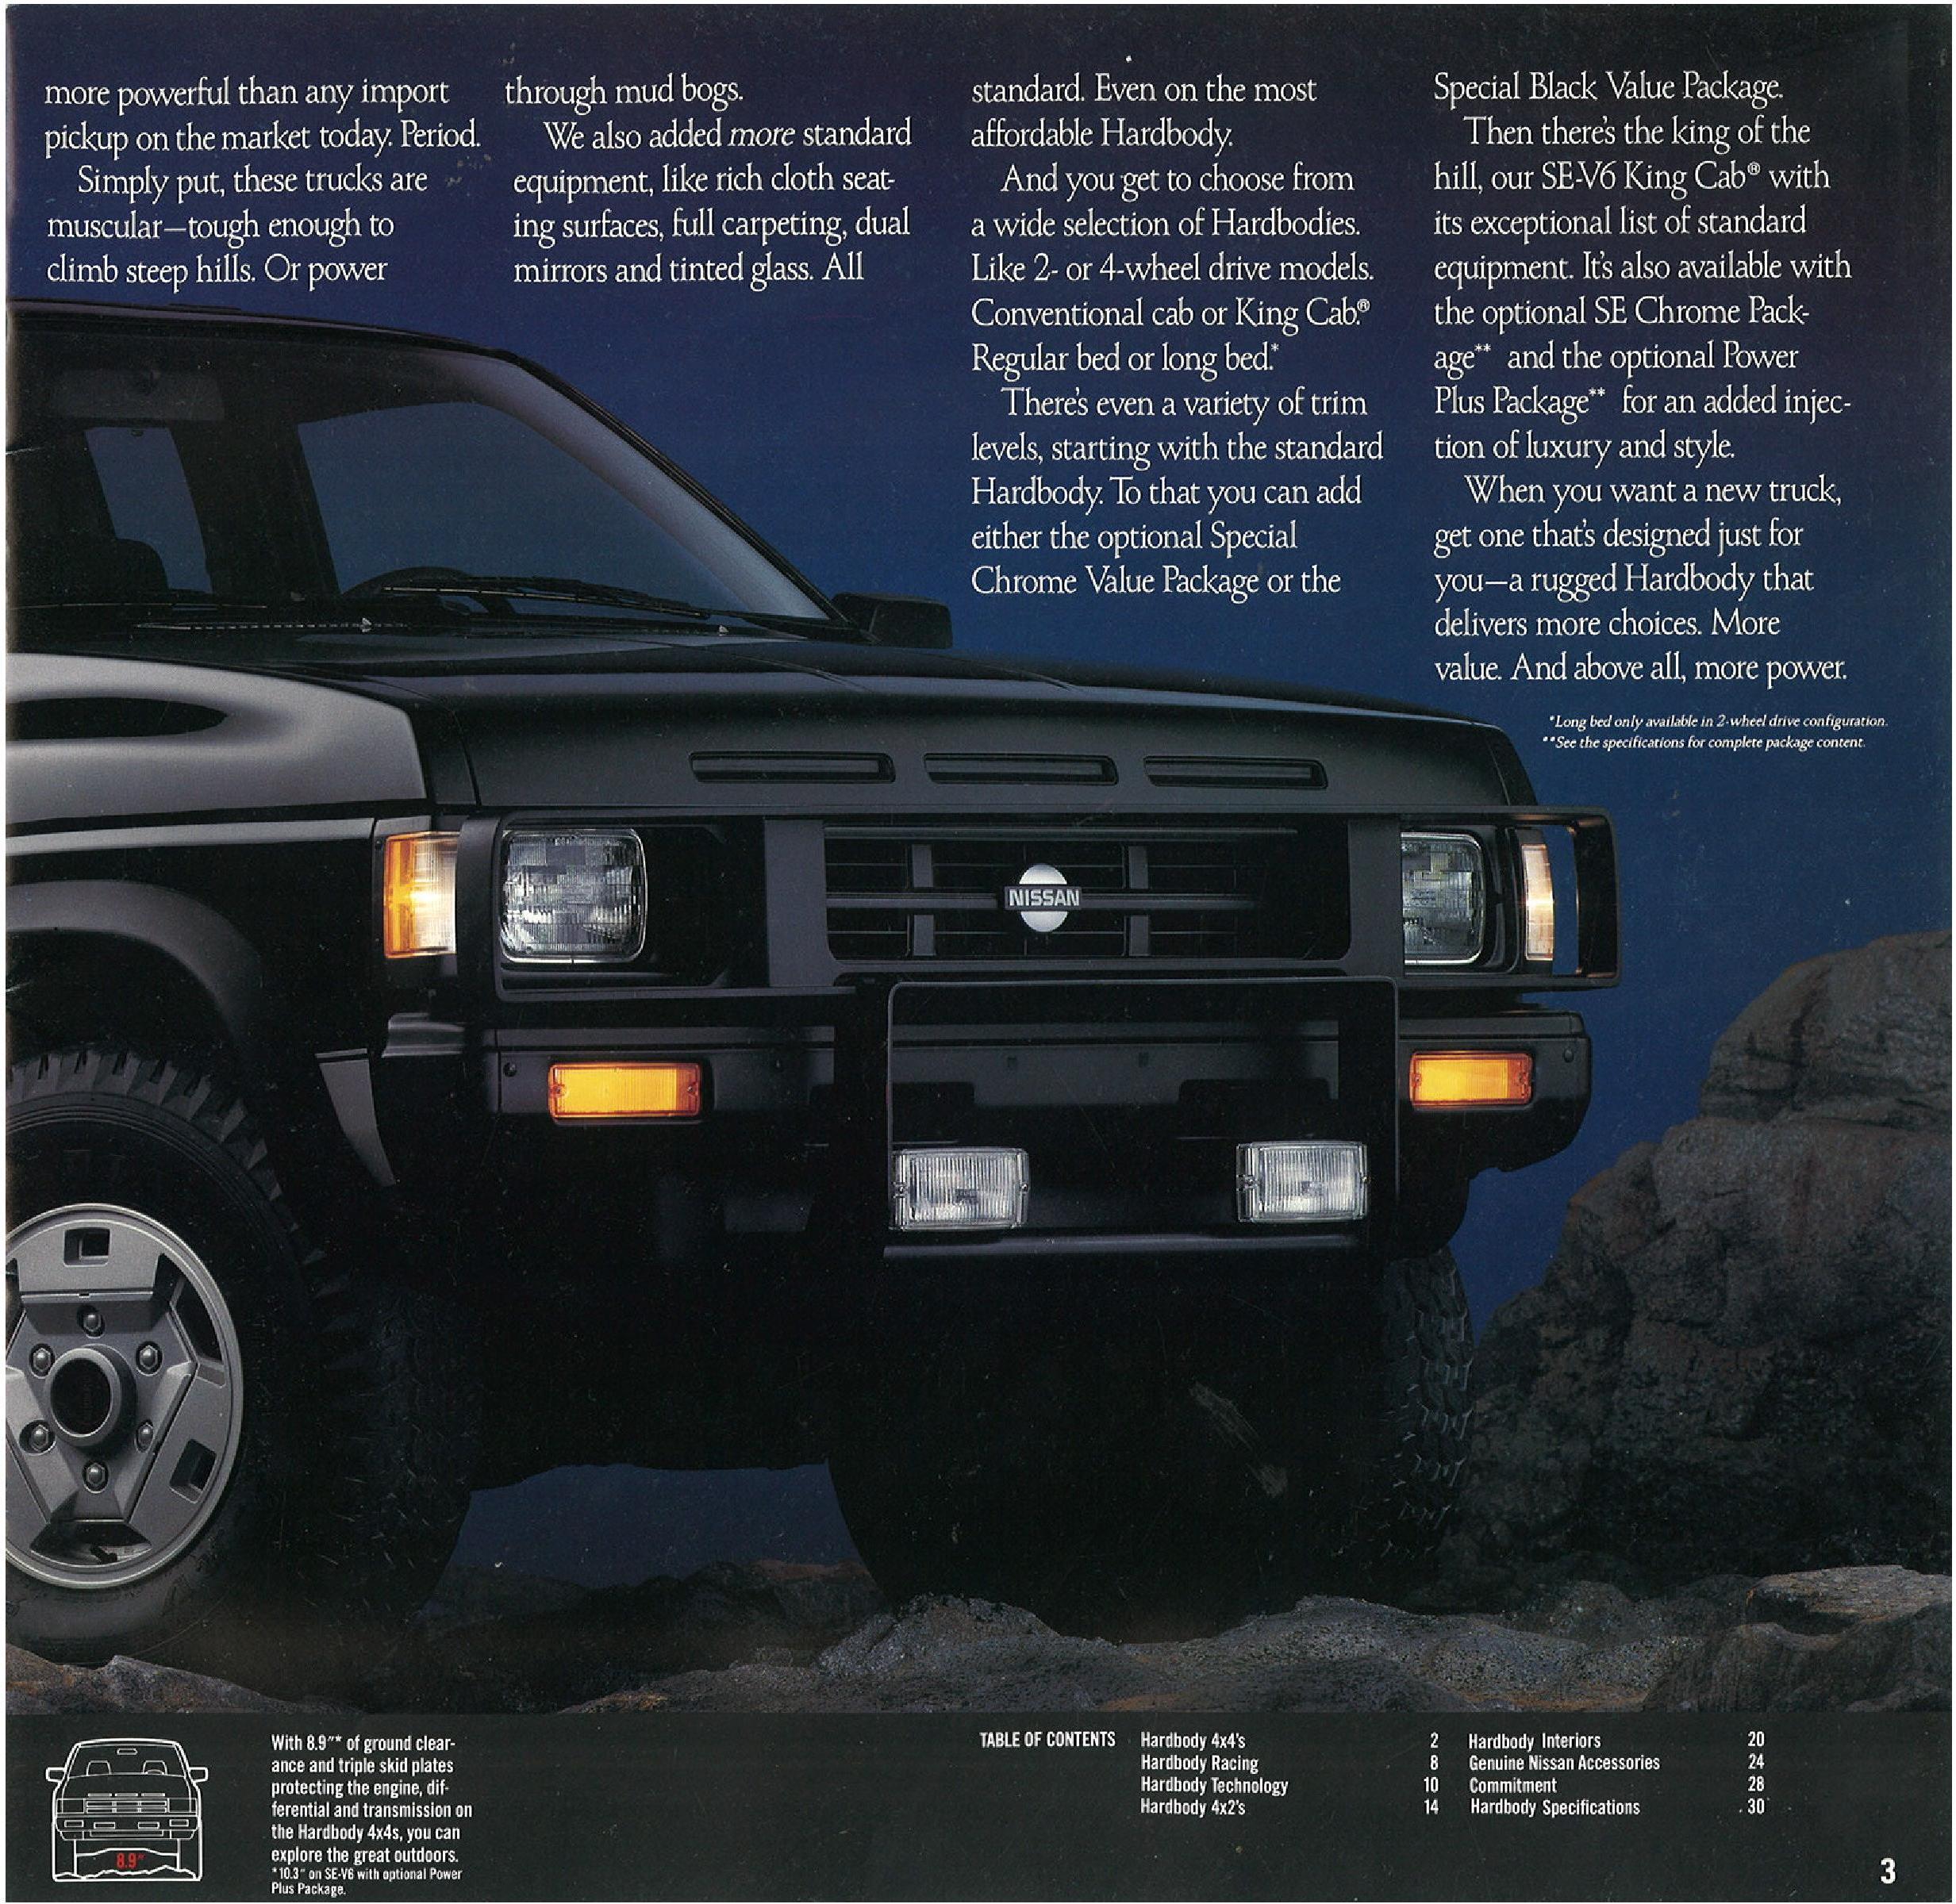 1990 Nissan Hardbody Trucks Dealer Brochure - NICOclub